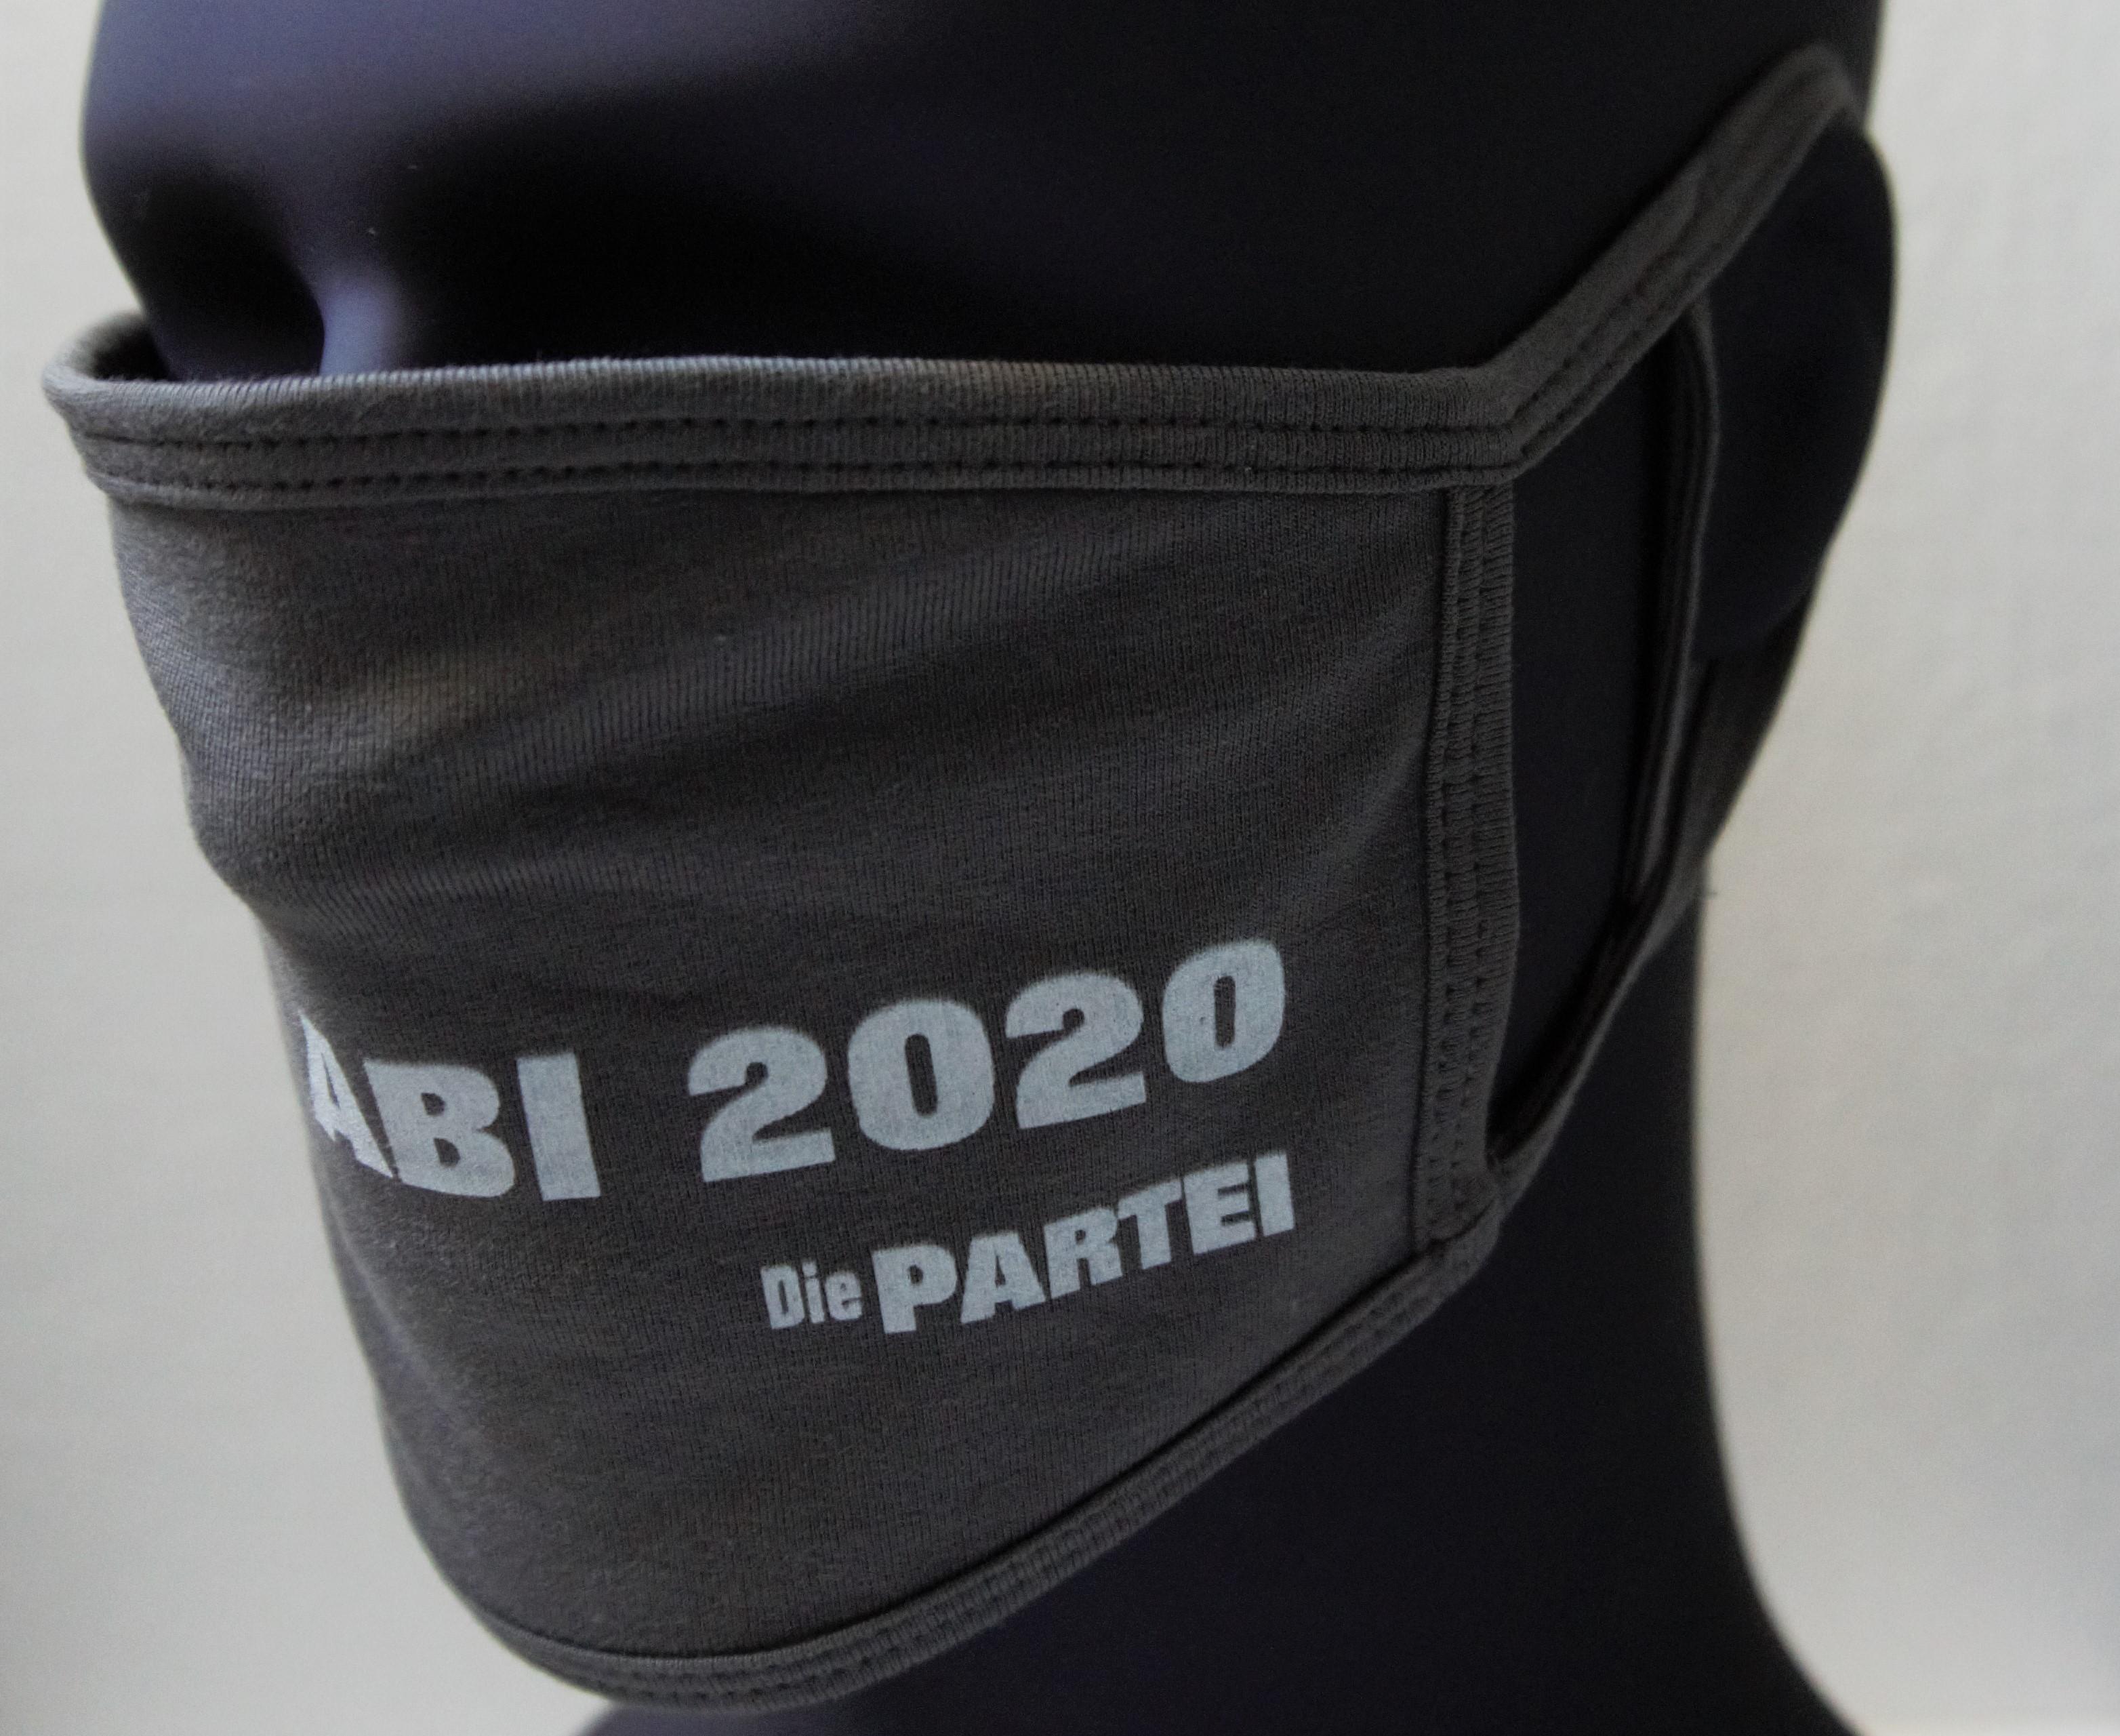 Partei-Maske-Abi2020